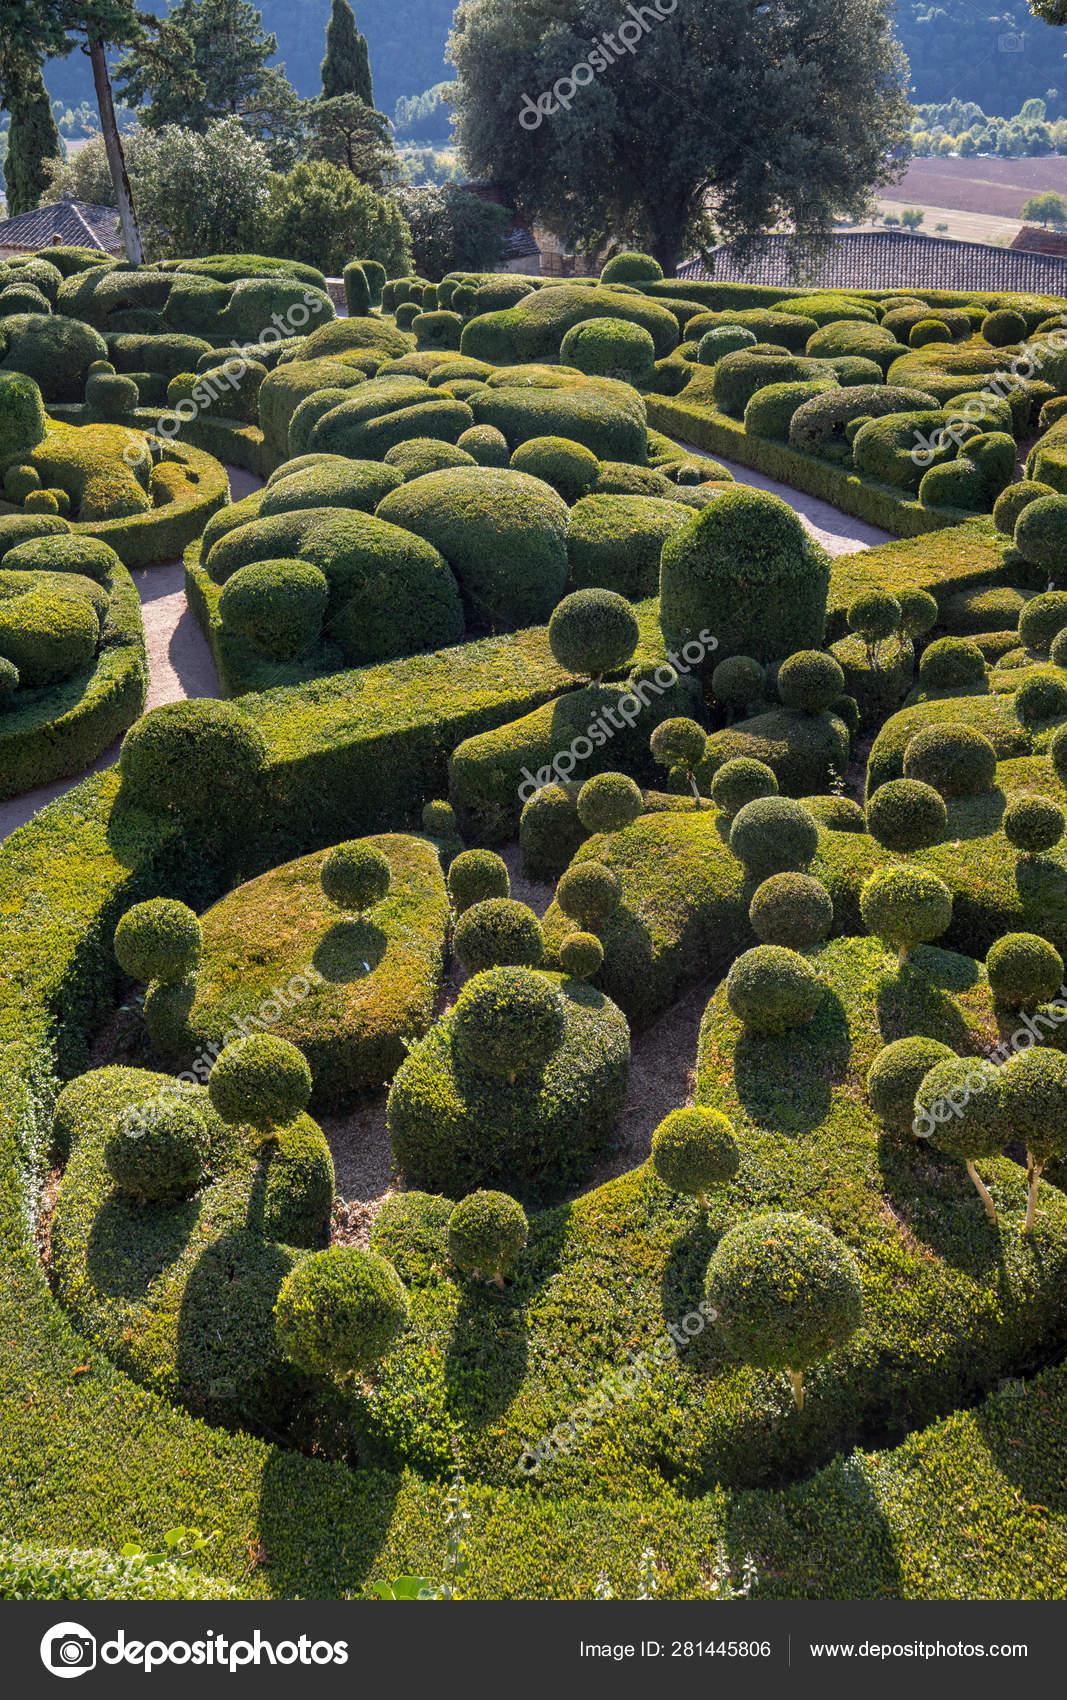 depositphotos stock photo dordogne france september 2018 topiary